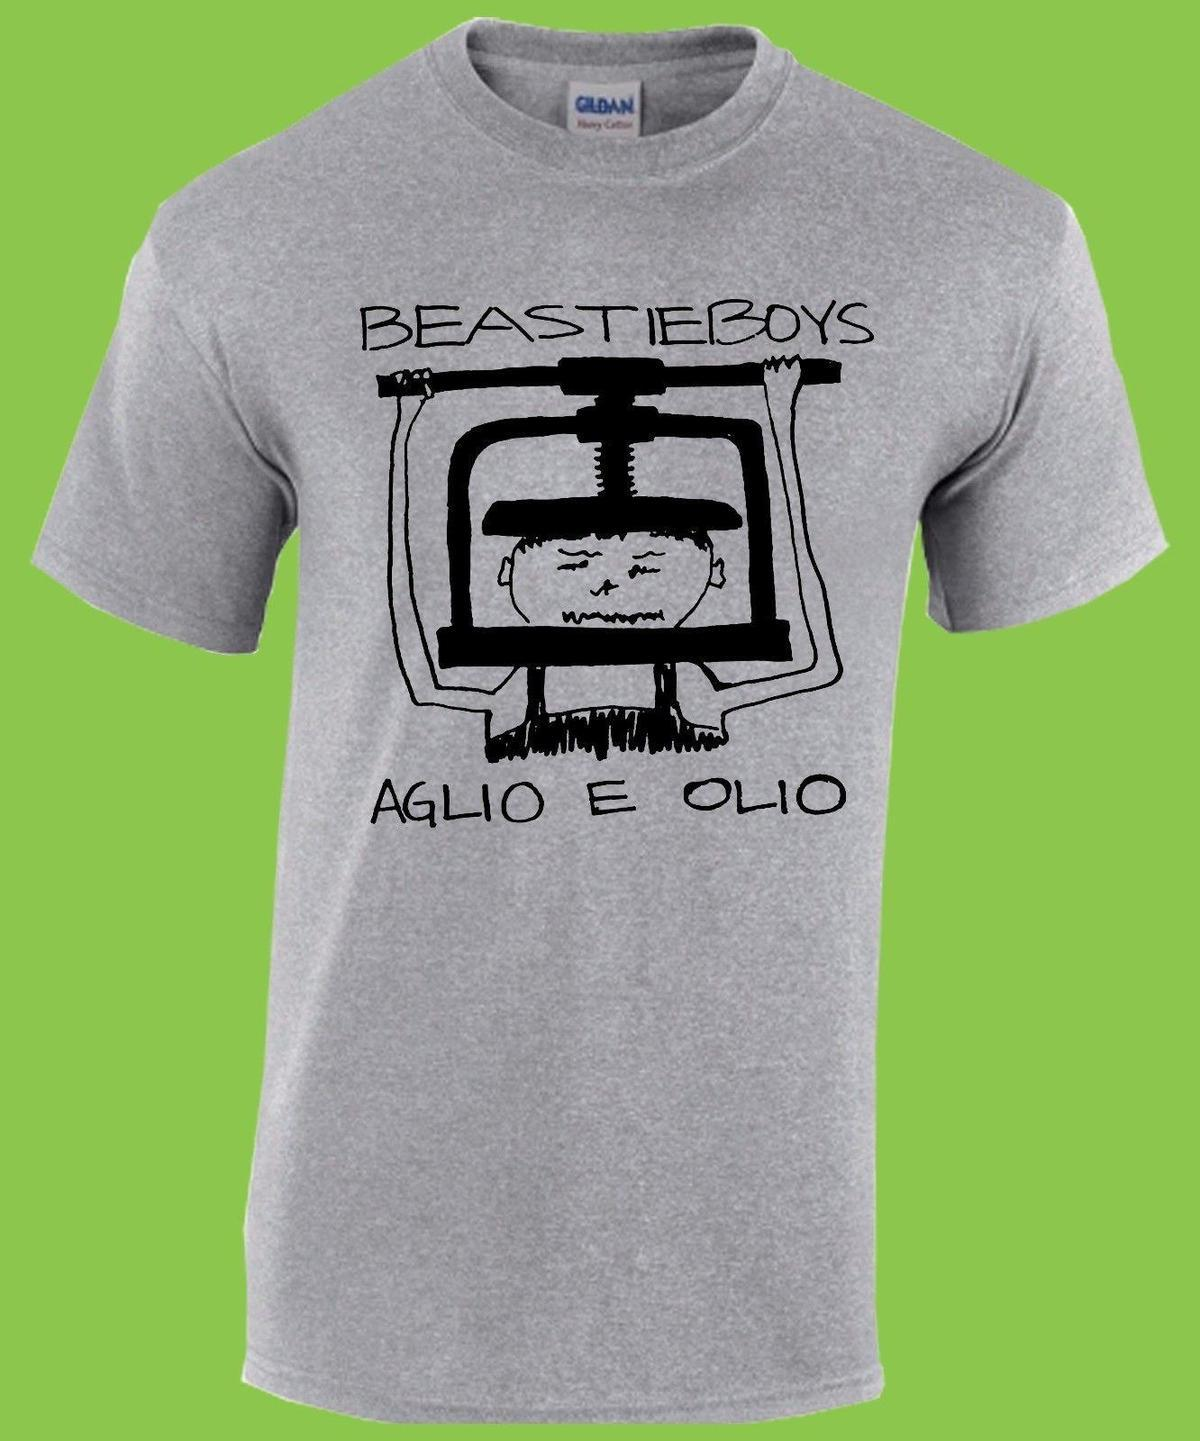 de37c83f BEASTIE BOYS Aglio E Olio T Shirt Public Enemy, RHCP, Bad Brains, Fugazi  Clever Funny T Shirts Funny Tshirts From Linnan00002, $14.67| DHgate.